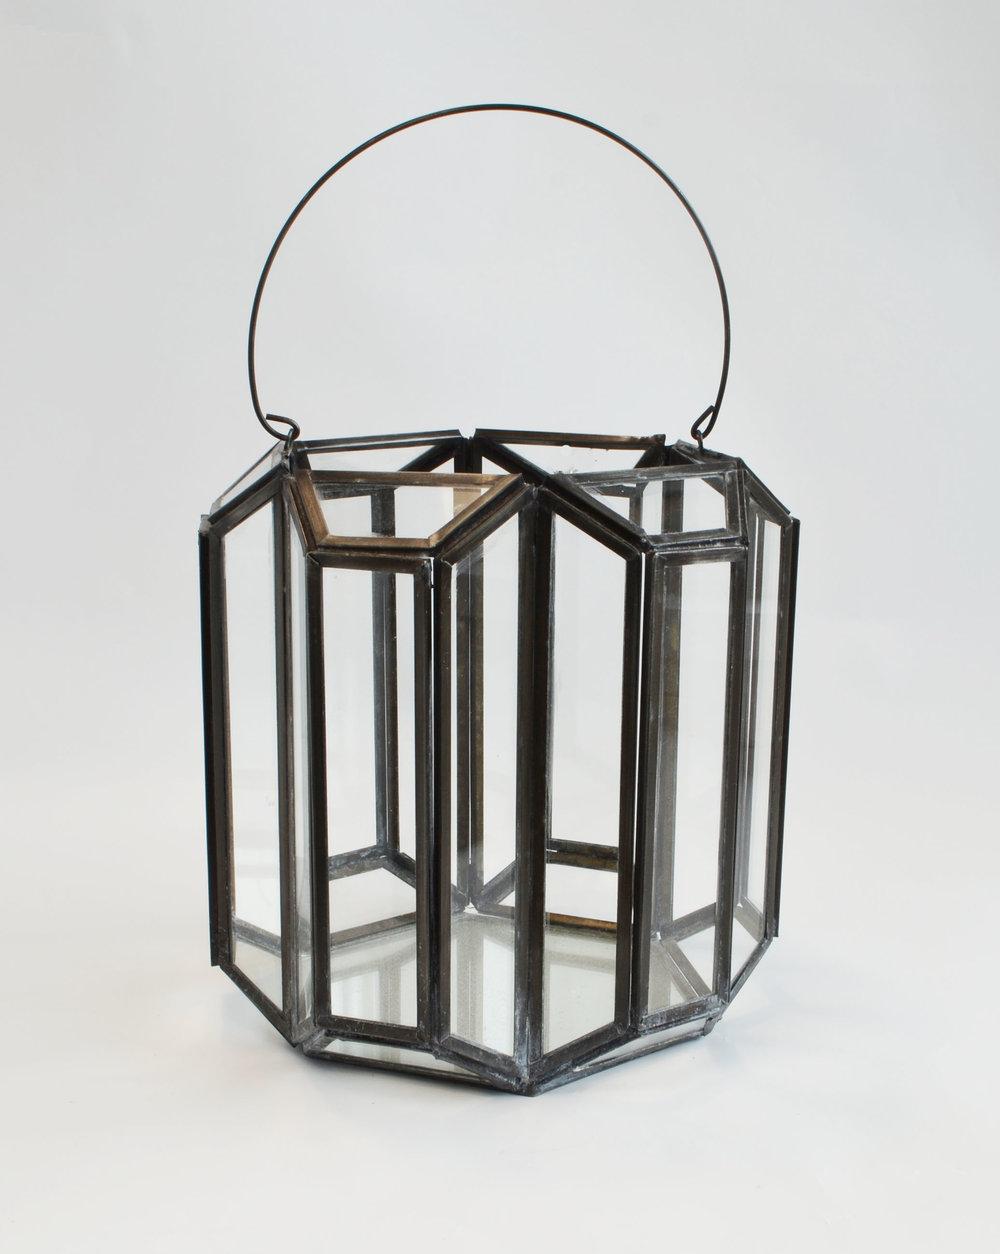 black geo polygon lantern   Quantity: 2  Price: $20.00